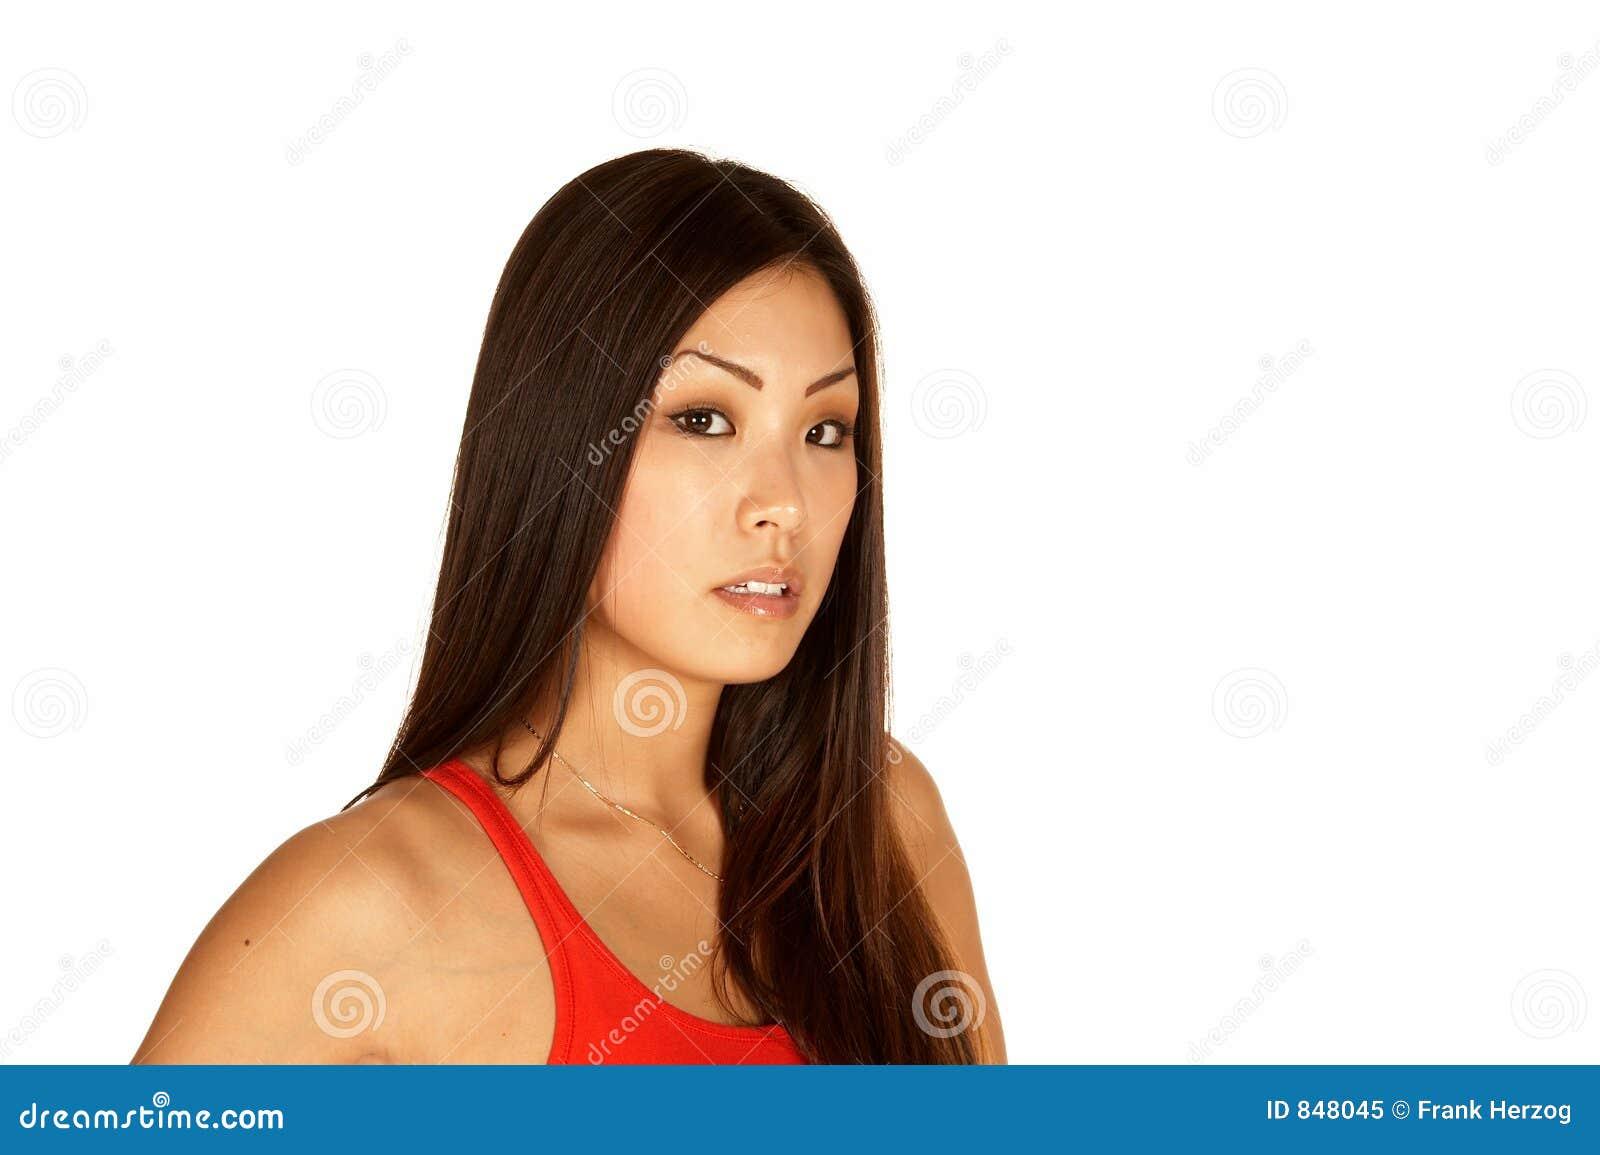 Beautiful Asian Young Woman Looking at the Camera